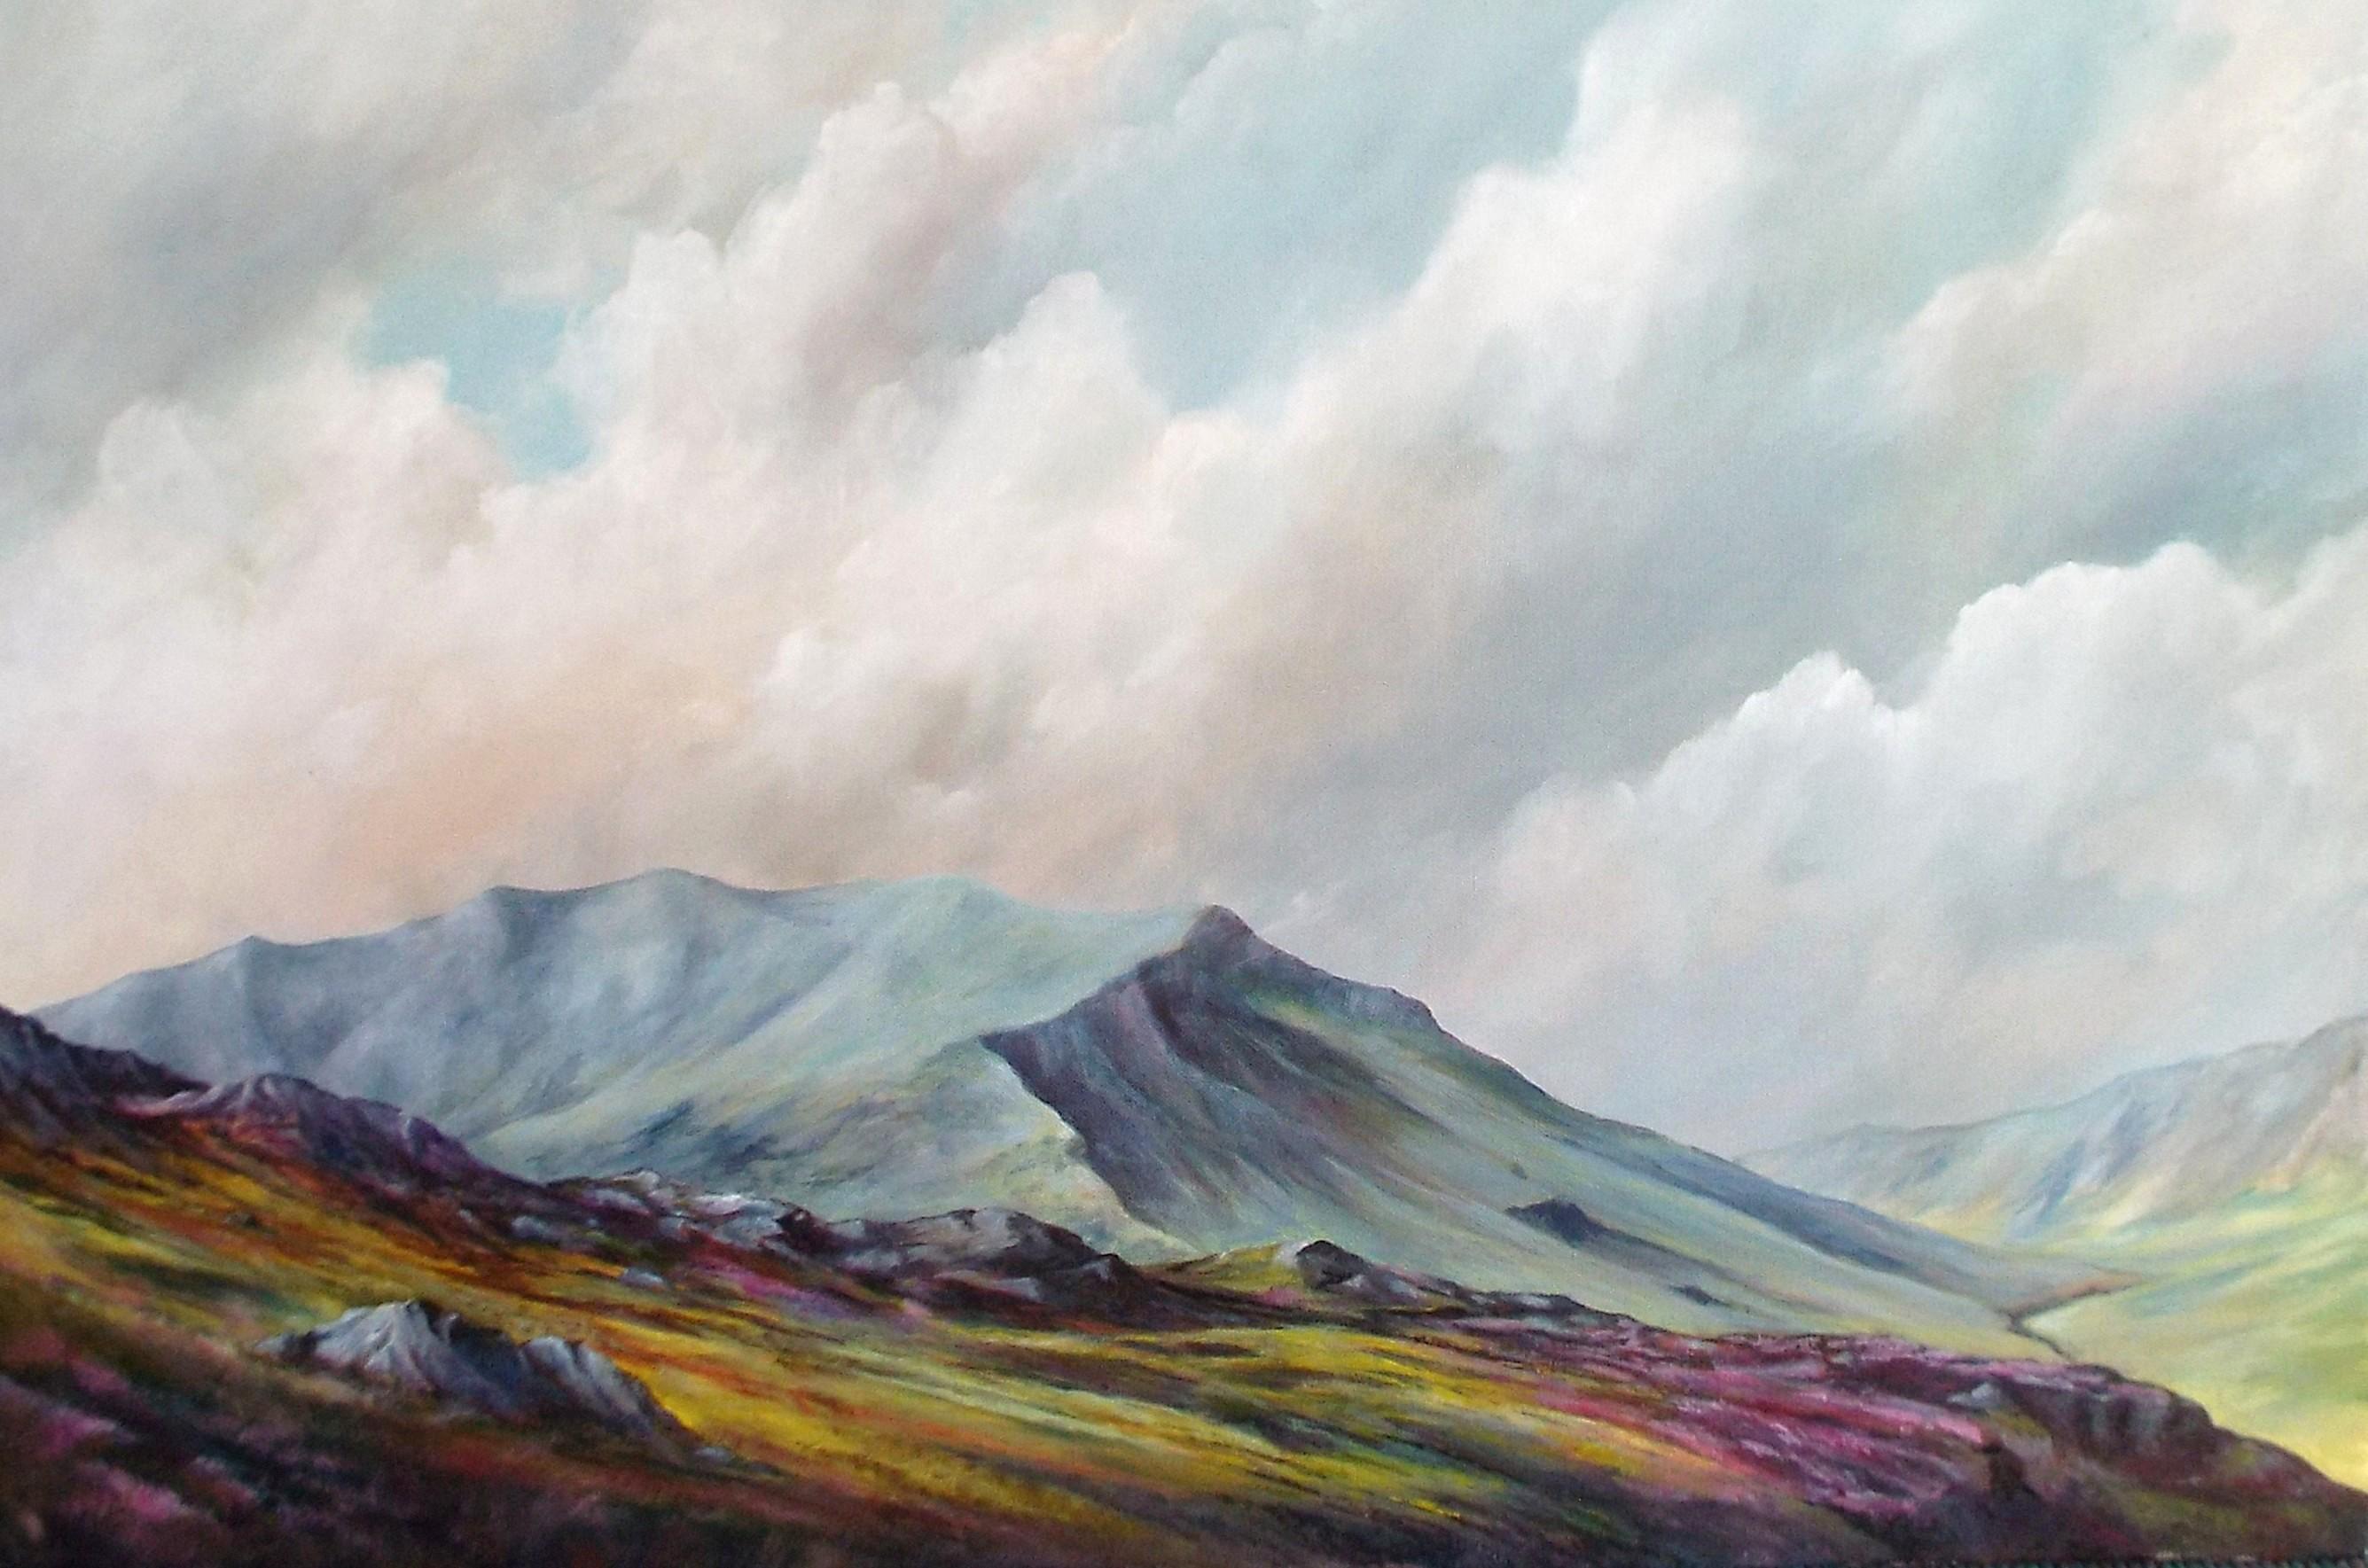 Glyderau Snowdon / Snowdonia